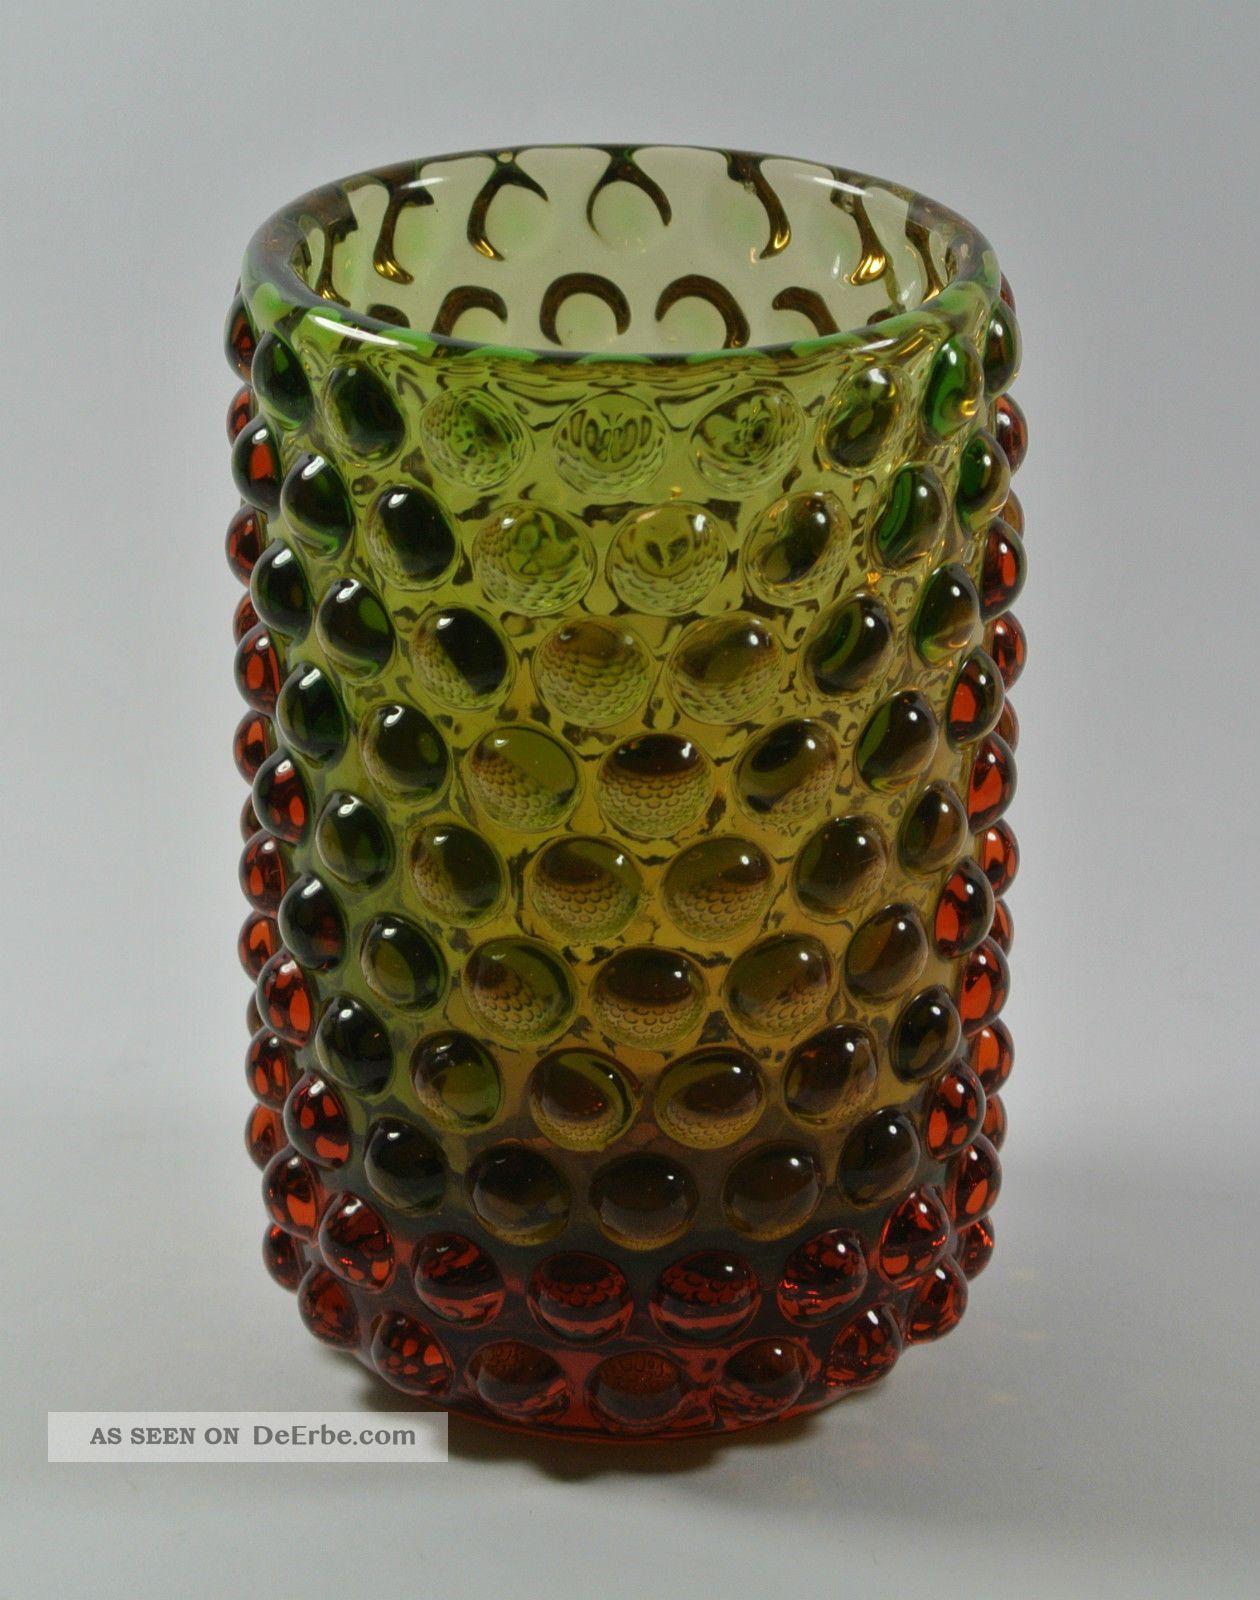 60s Wmf Vase Noppenvase Design: Erich Jachmann | Vintage Wmf Bubble Glass Vase Sammlerglas Bild